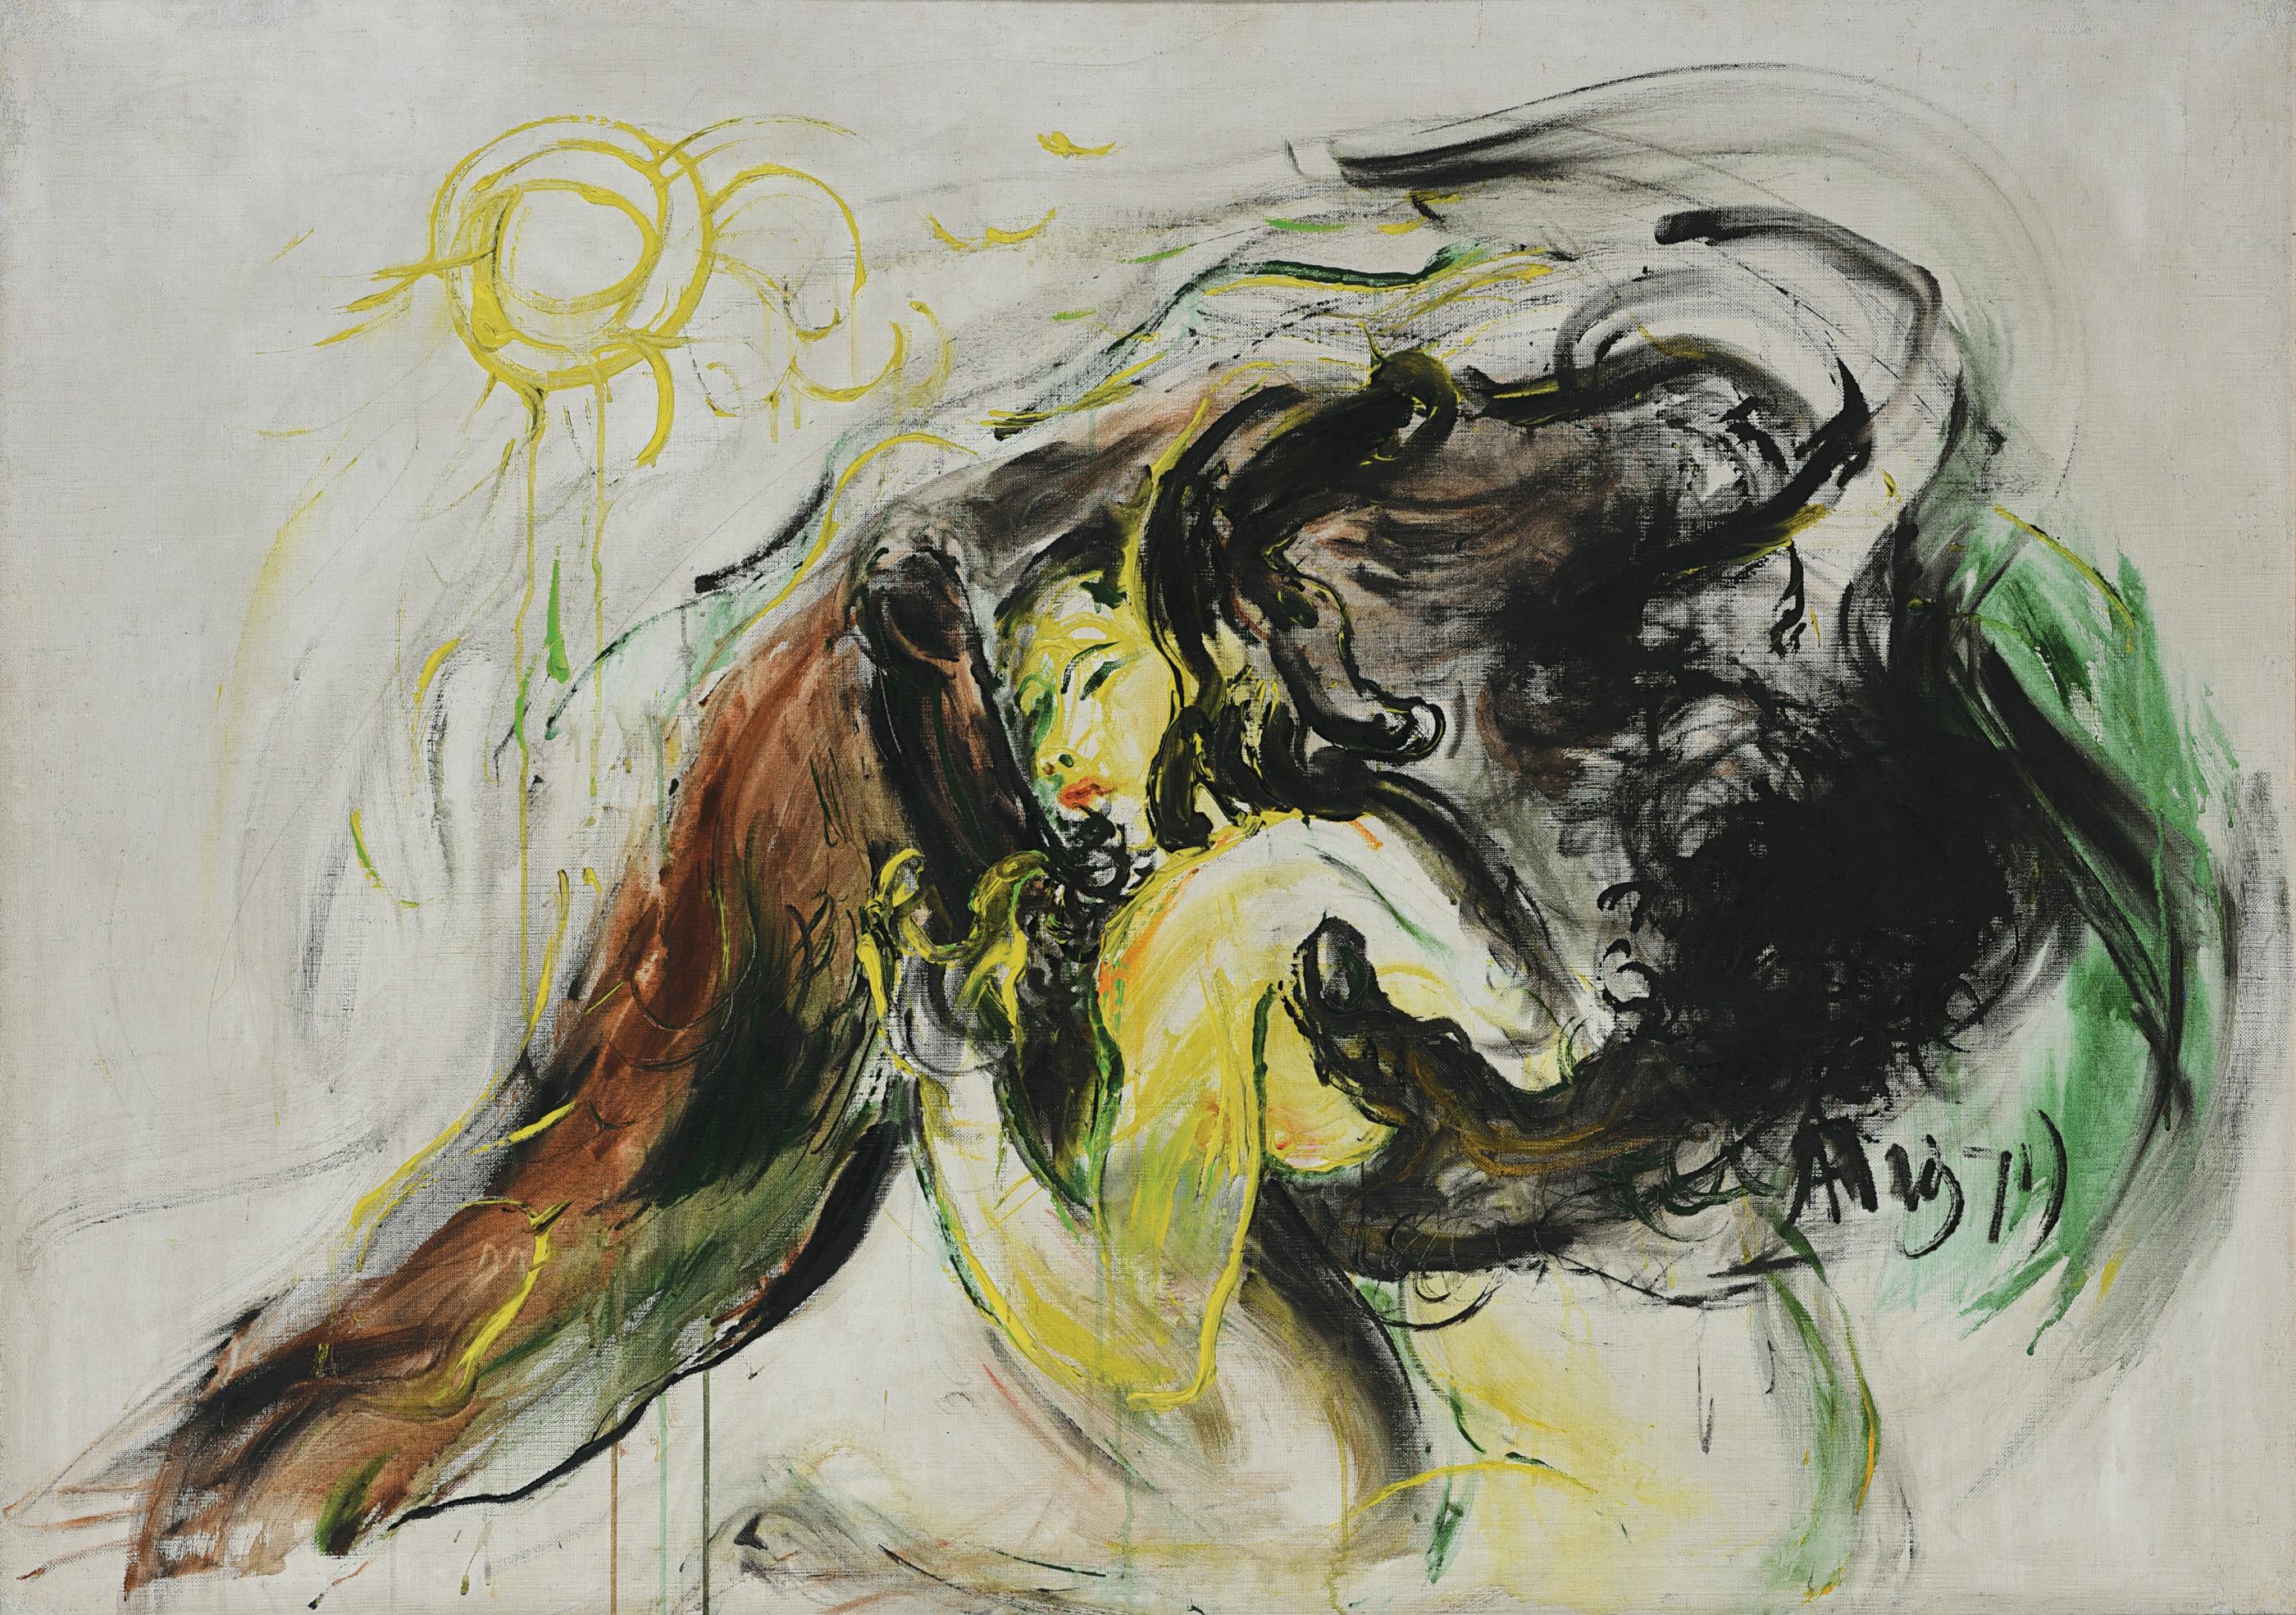 Affandi, Erotic, 1971, 99 x 138 cm